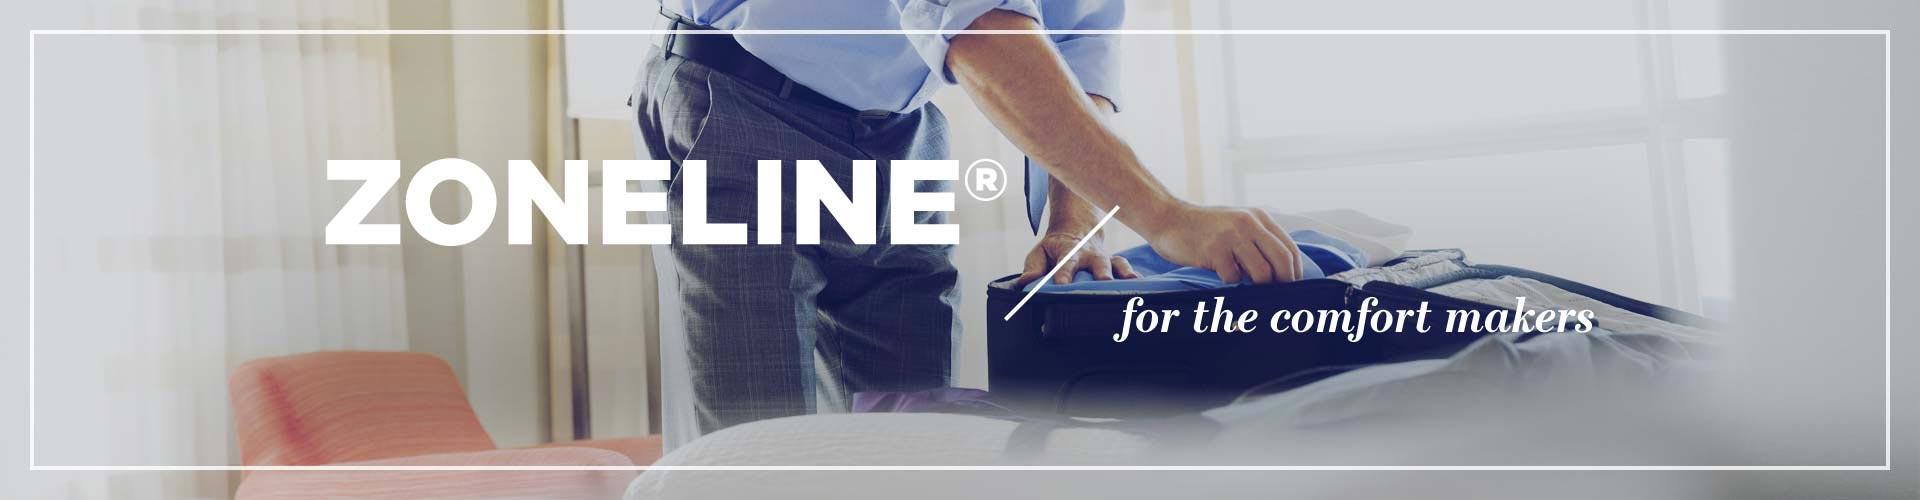 GE Zoneline Appliances at Abt